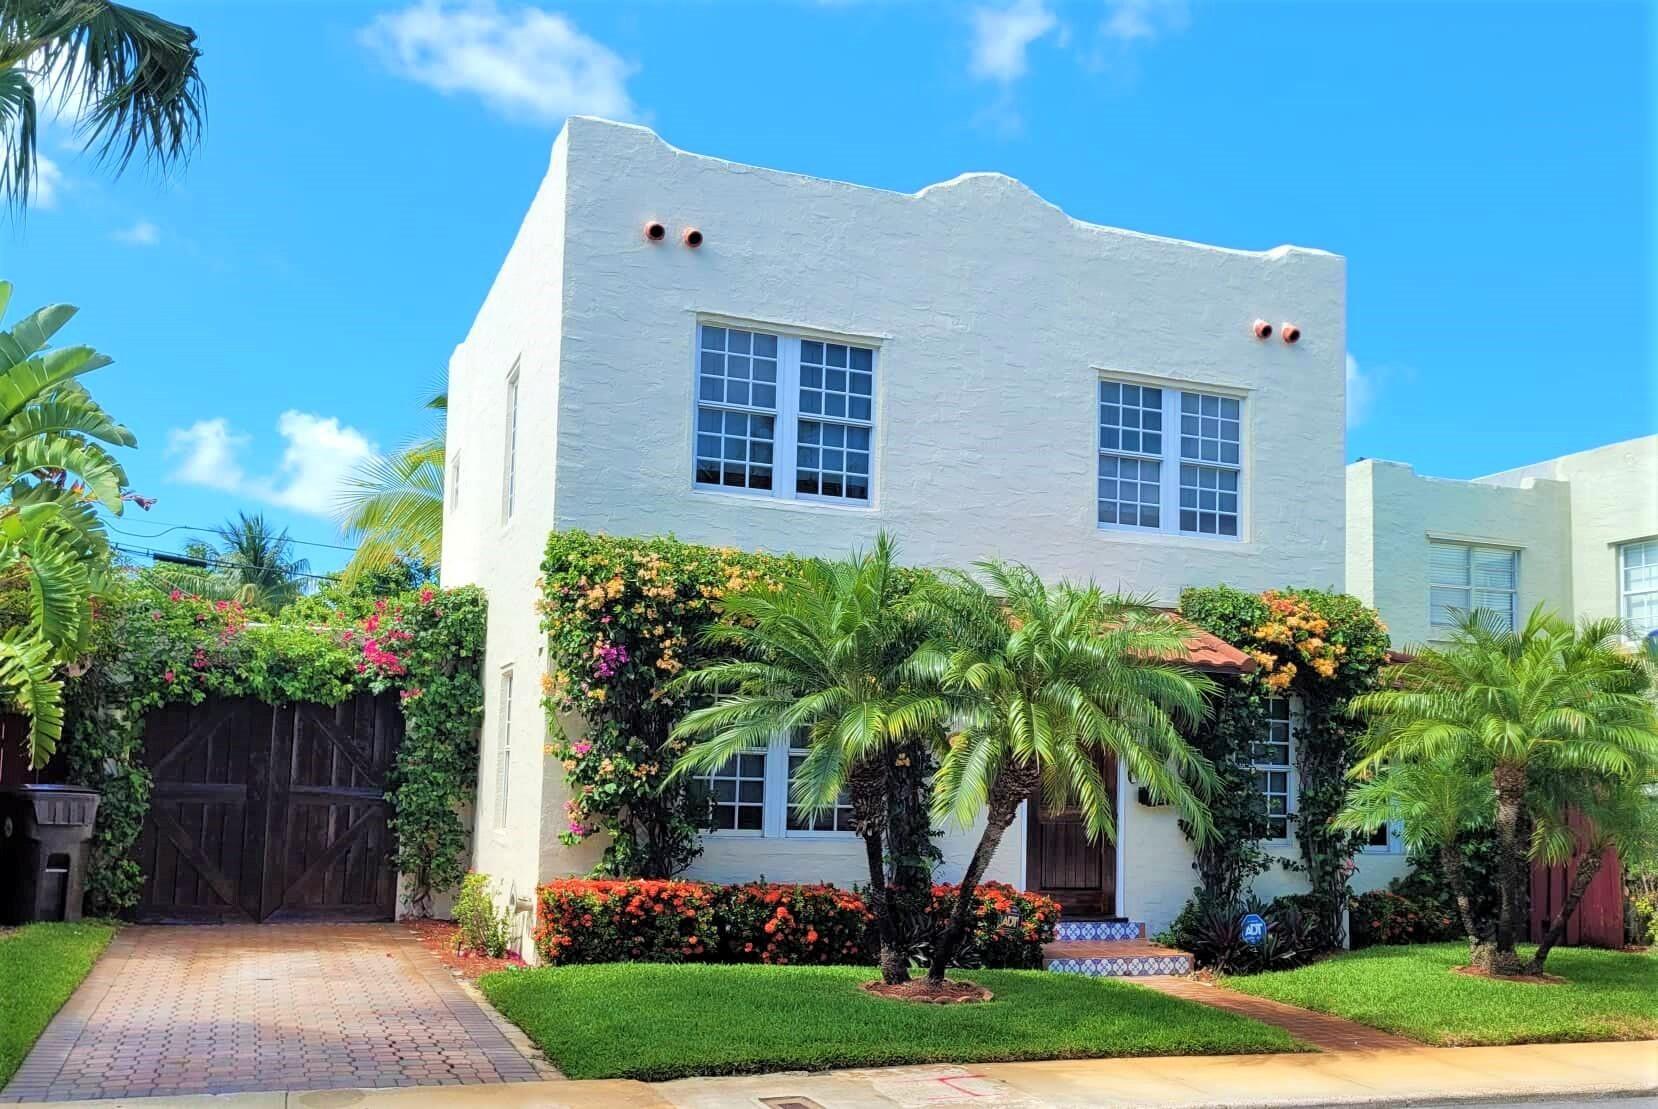 217 Lytton Court, West Palm Beach, FL 33405 - MLS#: RX-10742434